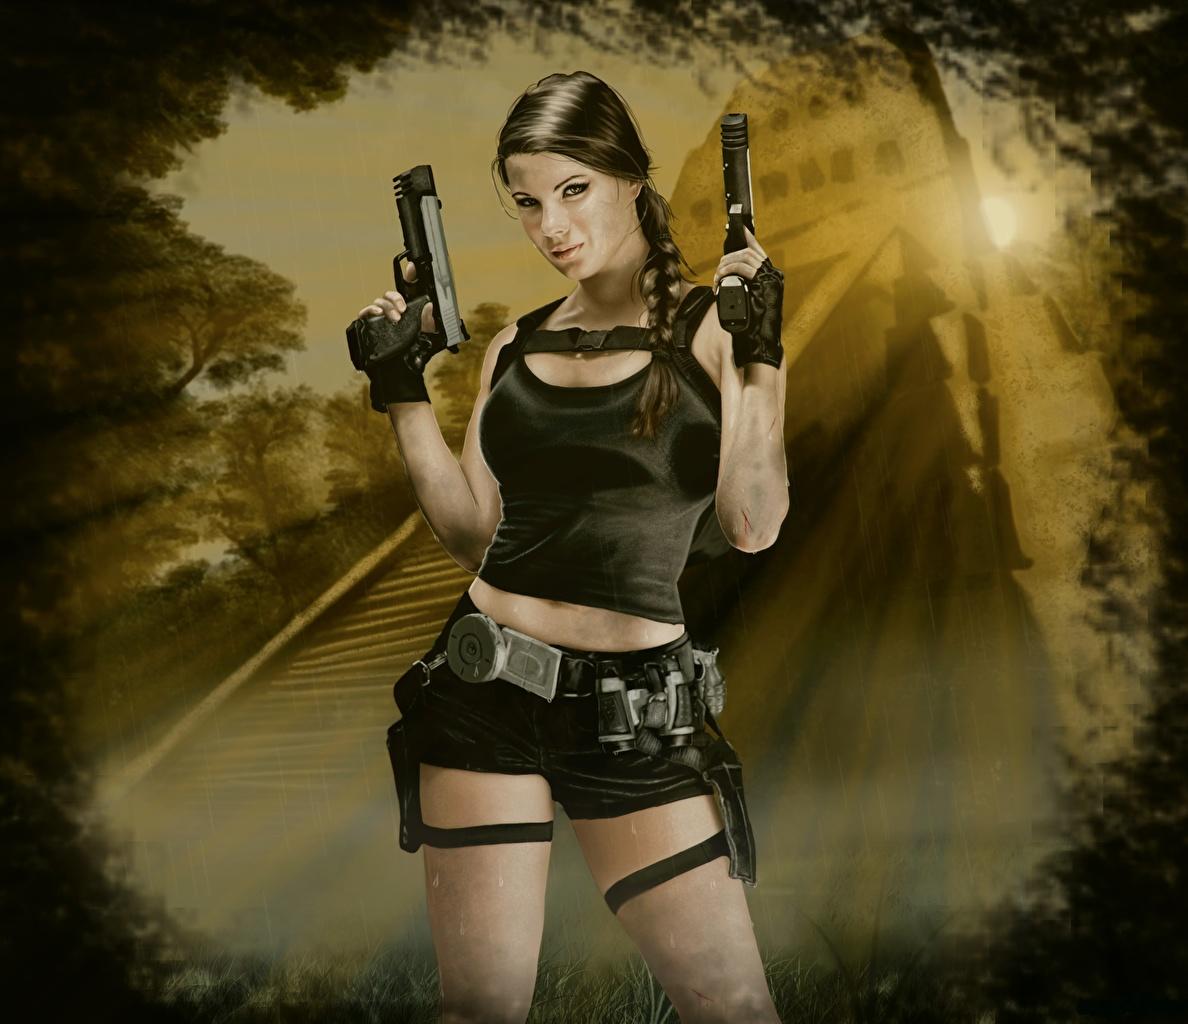 Art Lara Croft Shadow Of The Tomb Raider Desktop Wallpapers: Images Tomb Raider Underworld Pistol Lara Croft Girls Vdeo